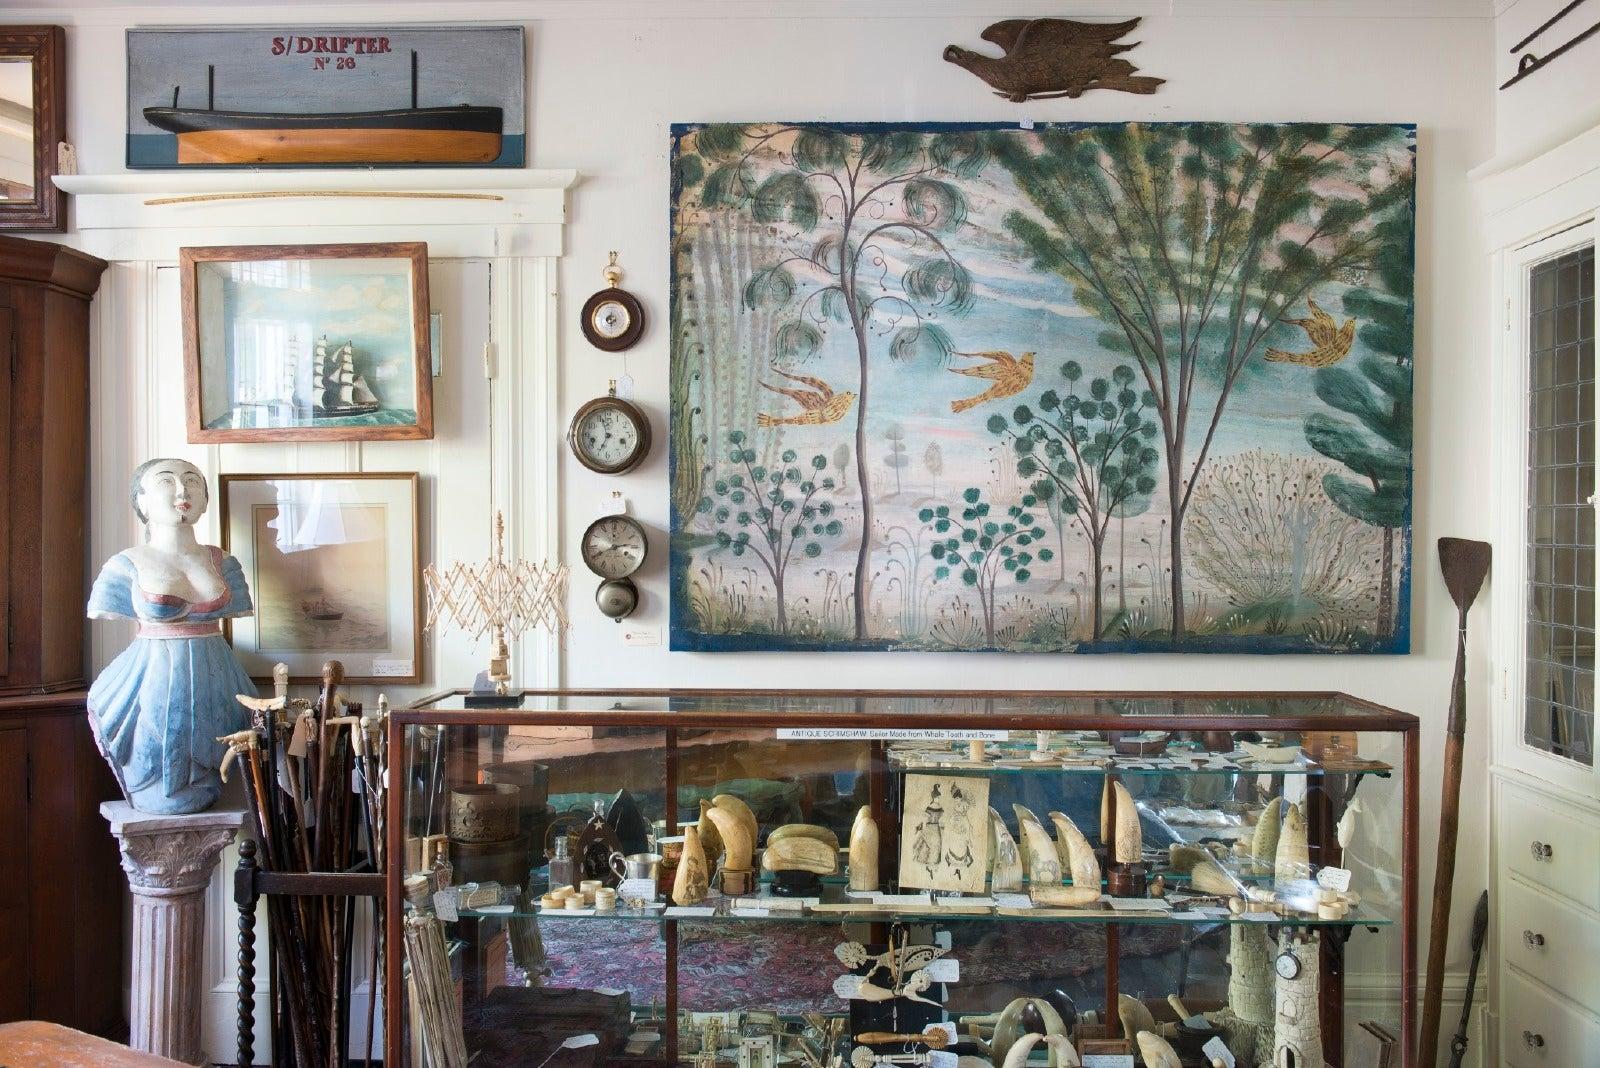 Nantucket House Antiques And Interior Design Studios Inc Nantucket Ma 02554 1stdibs